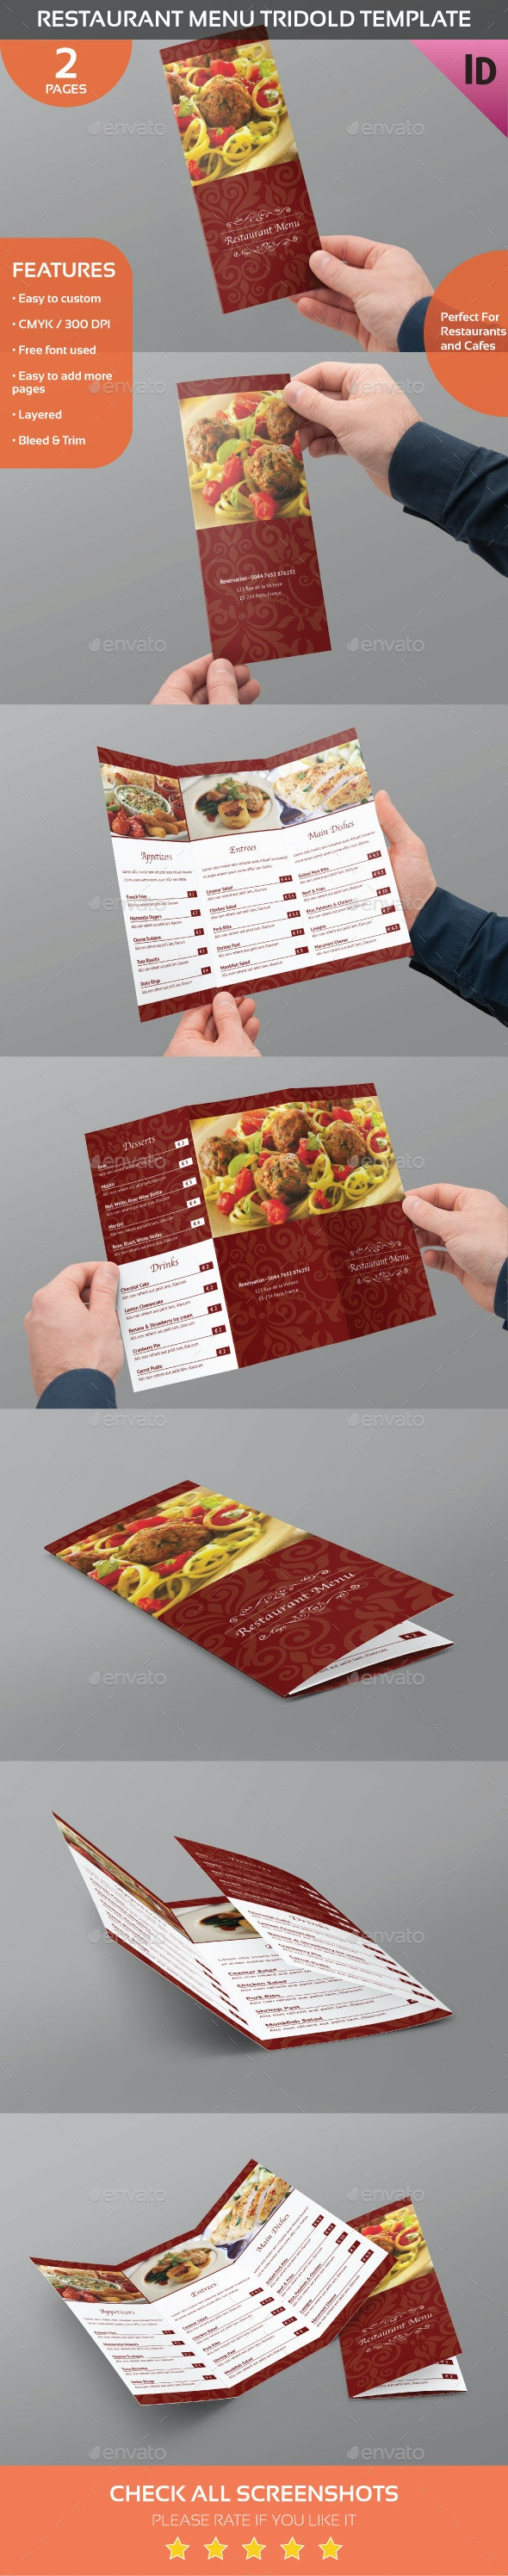 Restaurant Menu Trifold Template - Food Menus Print Templates